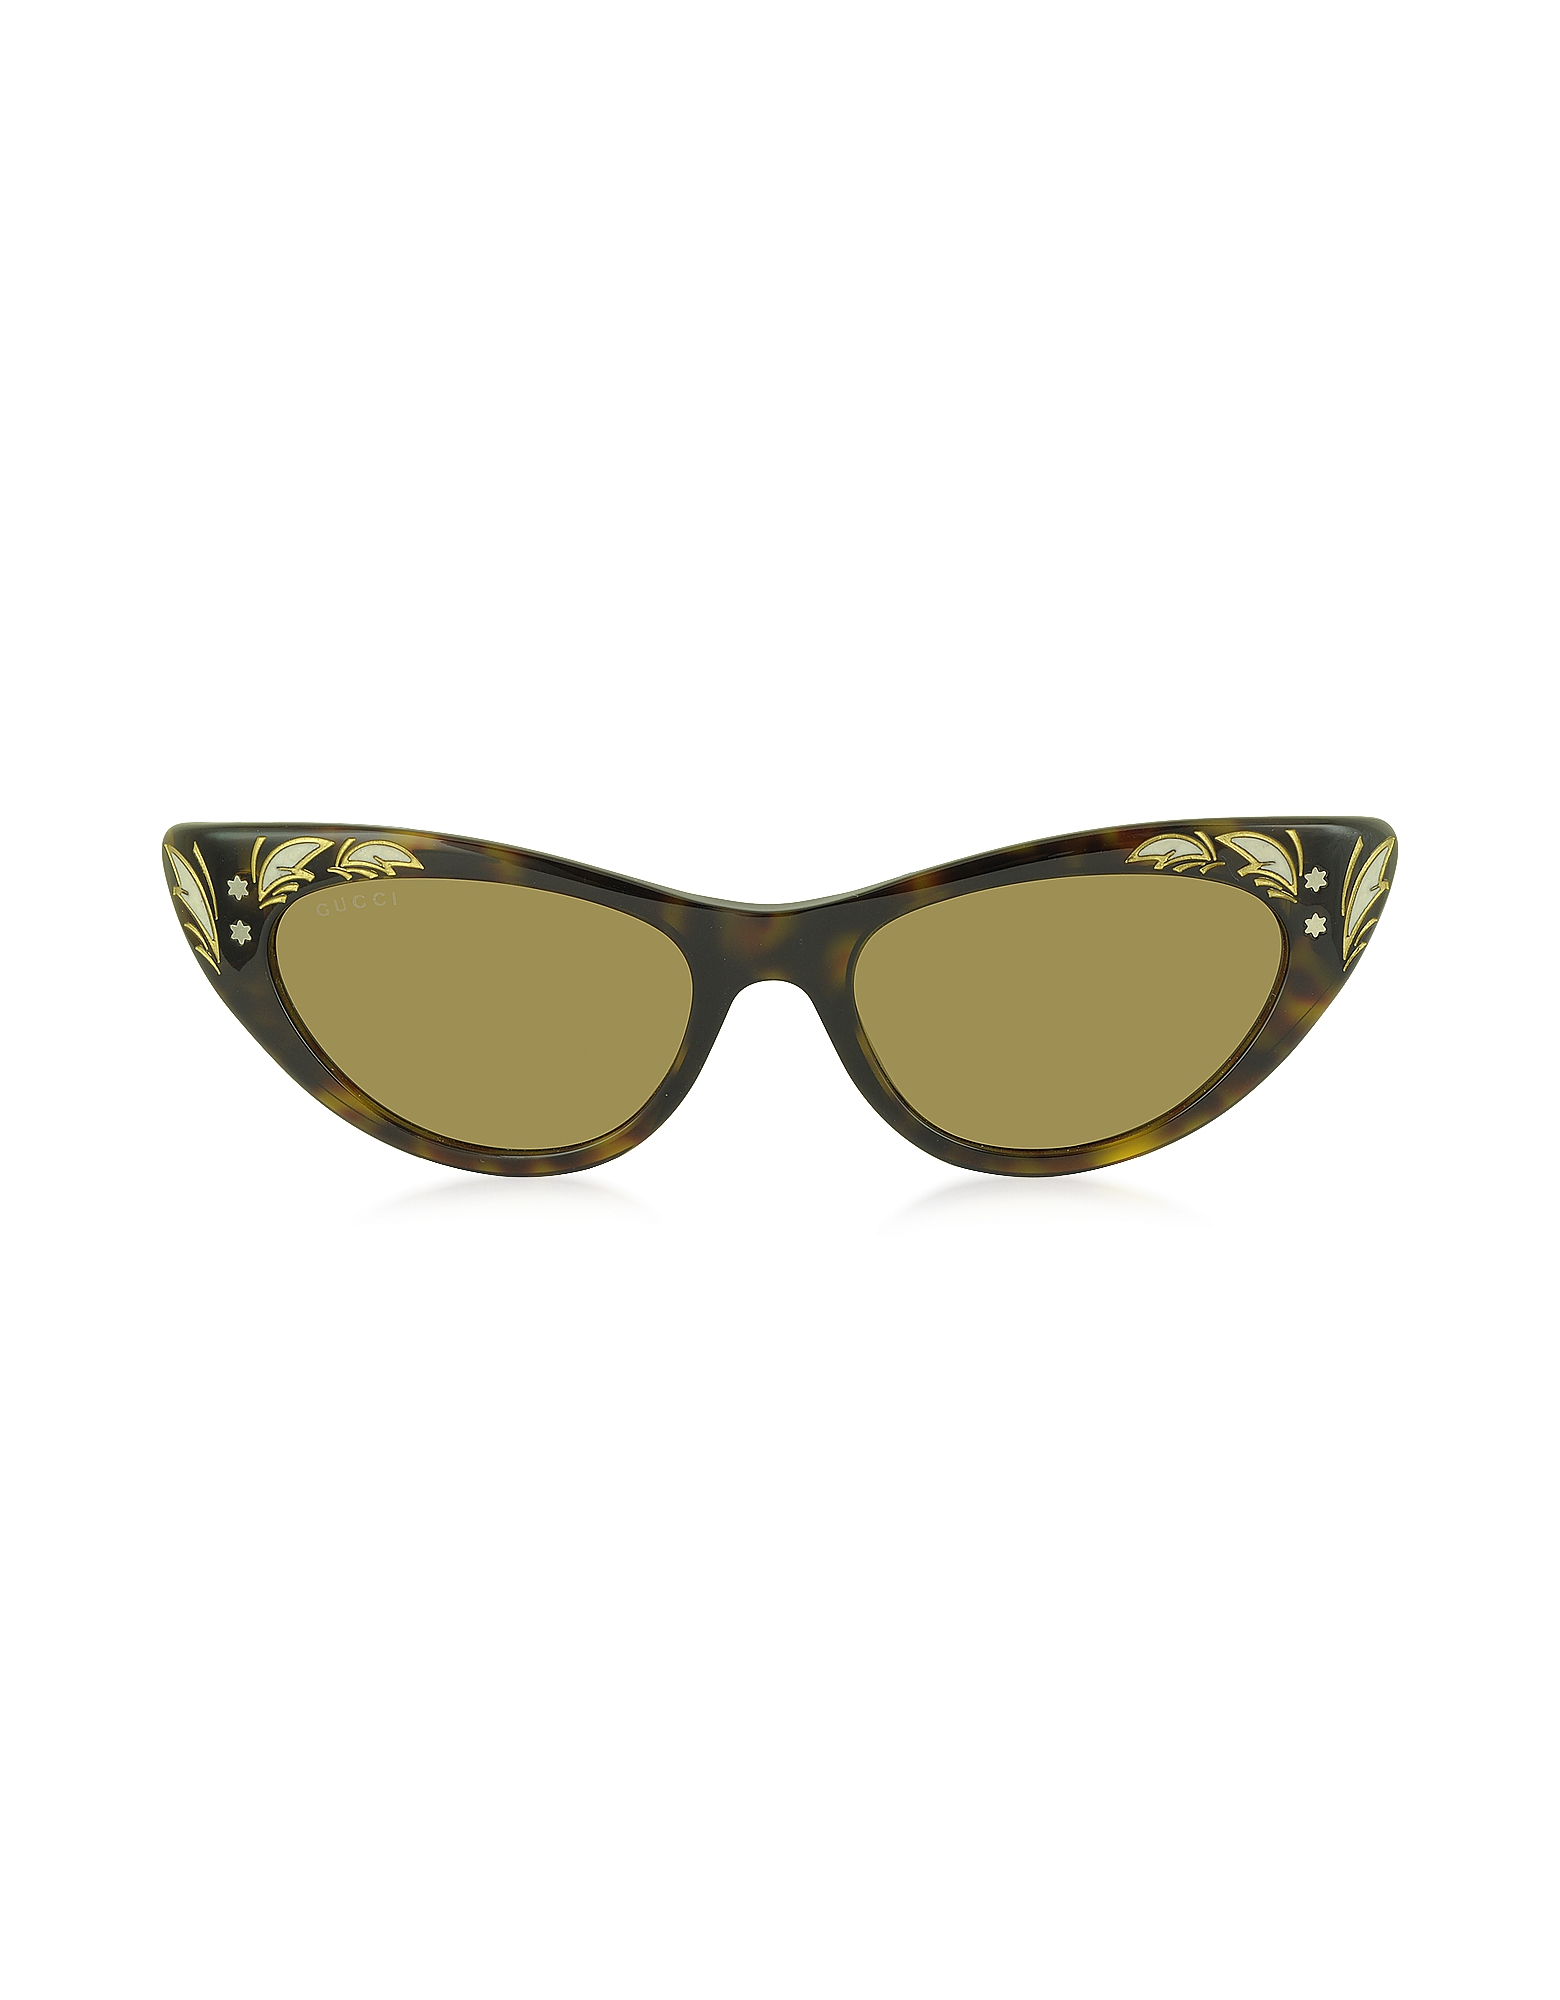 GG 3807/S 086N0 - Женские Солнечные Очки в Оправе Кошачий Глаз из Ацетата Гавана